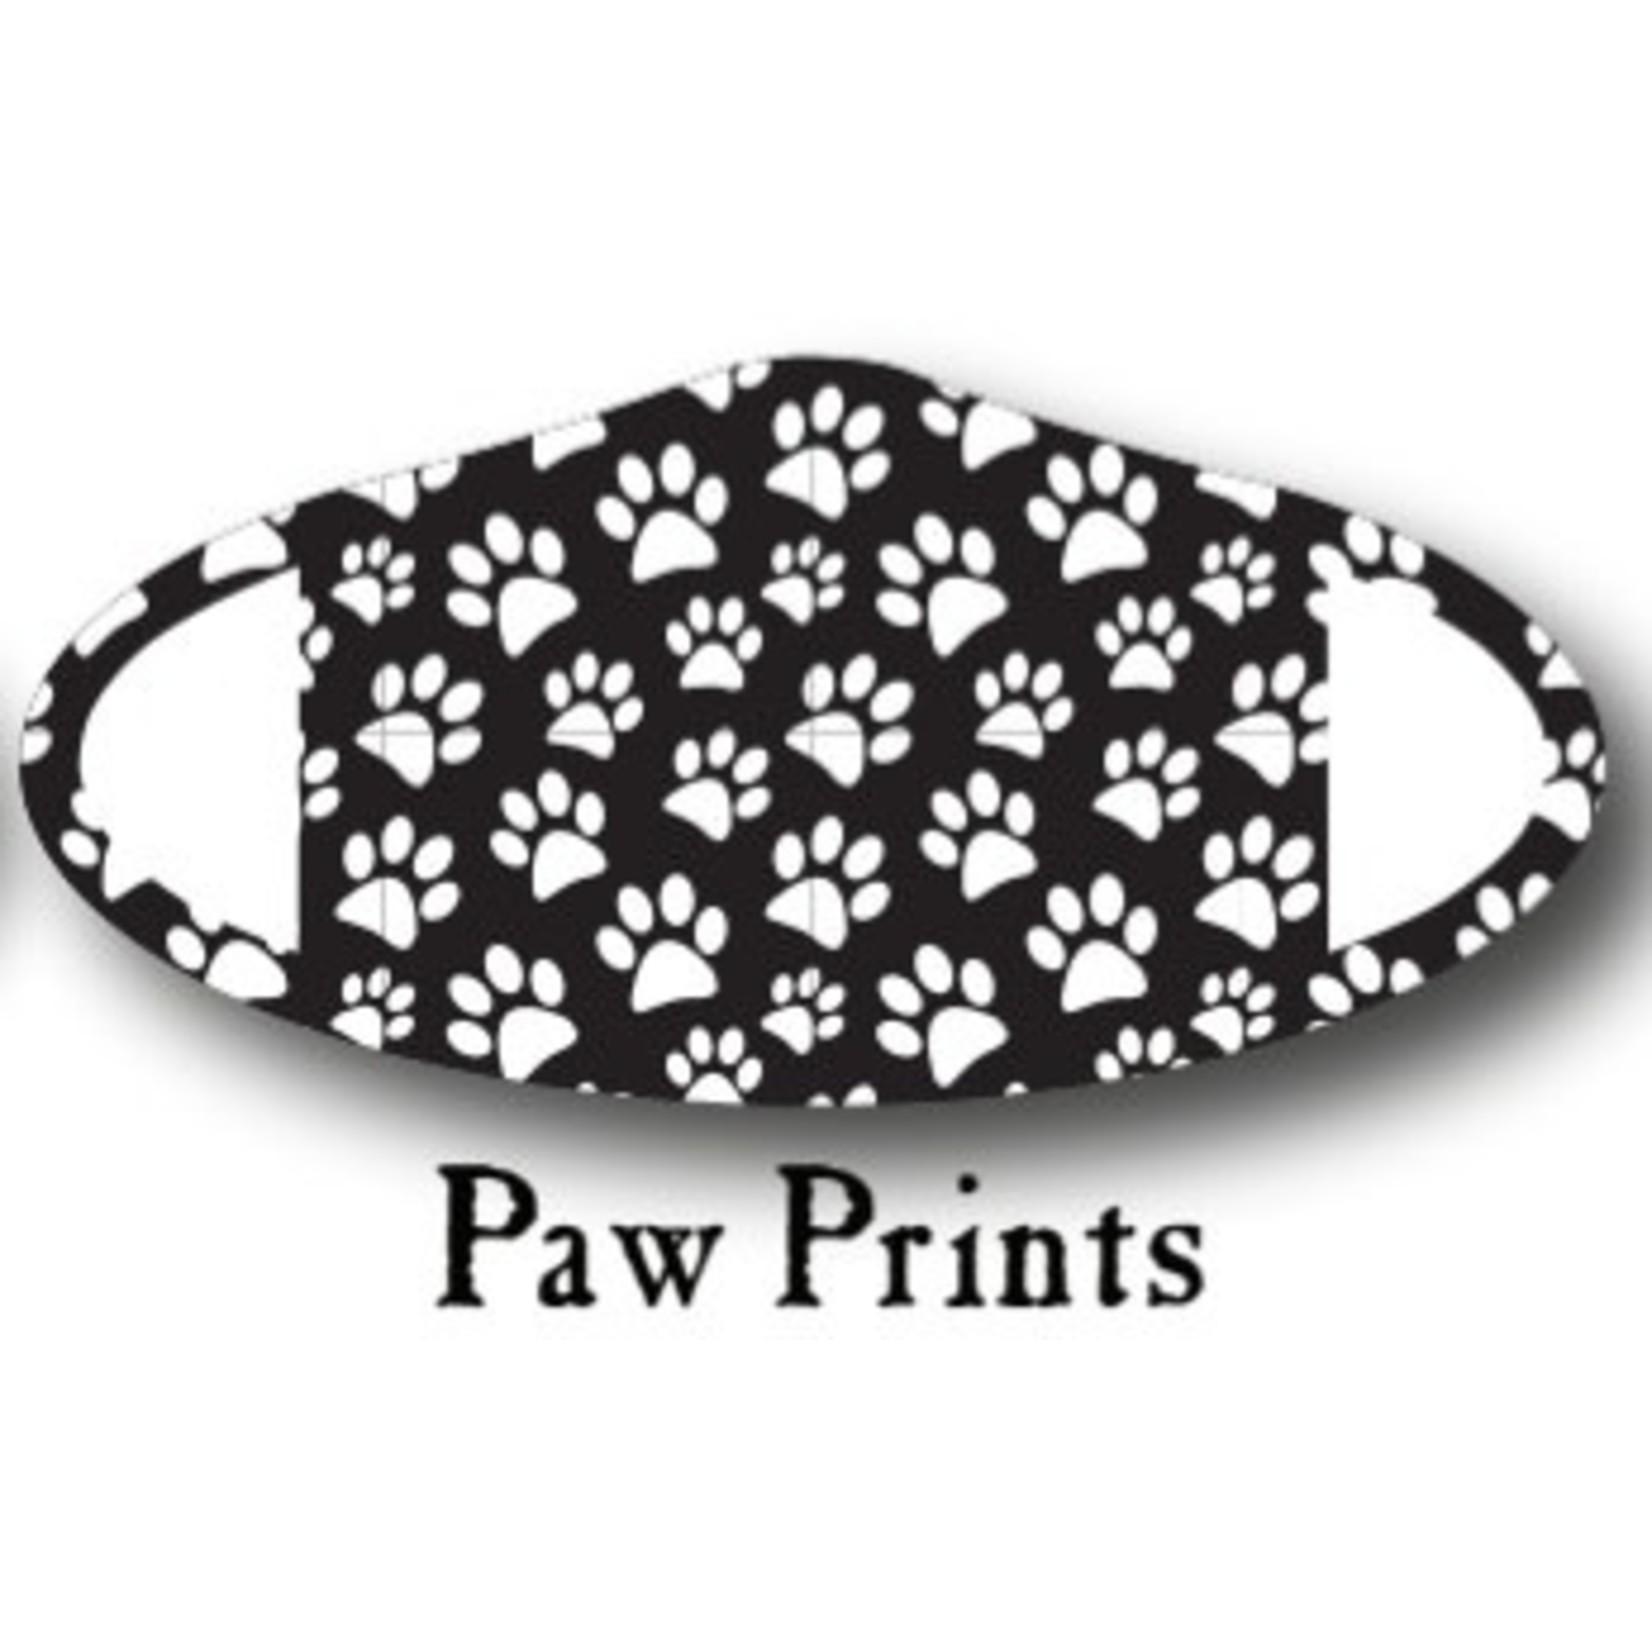 Deco Mask Paw Prints Mask